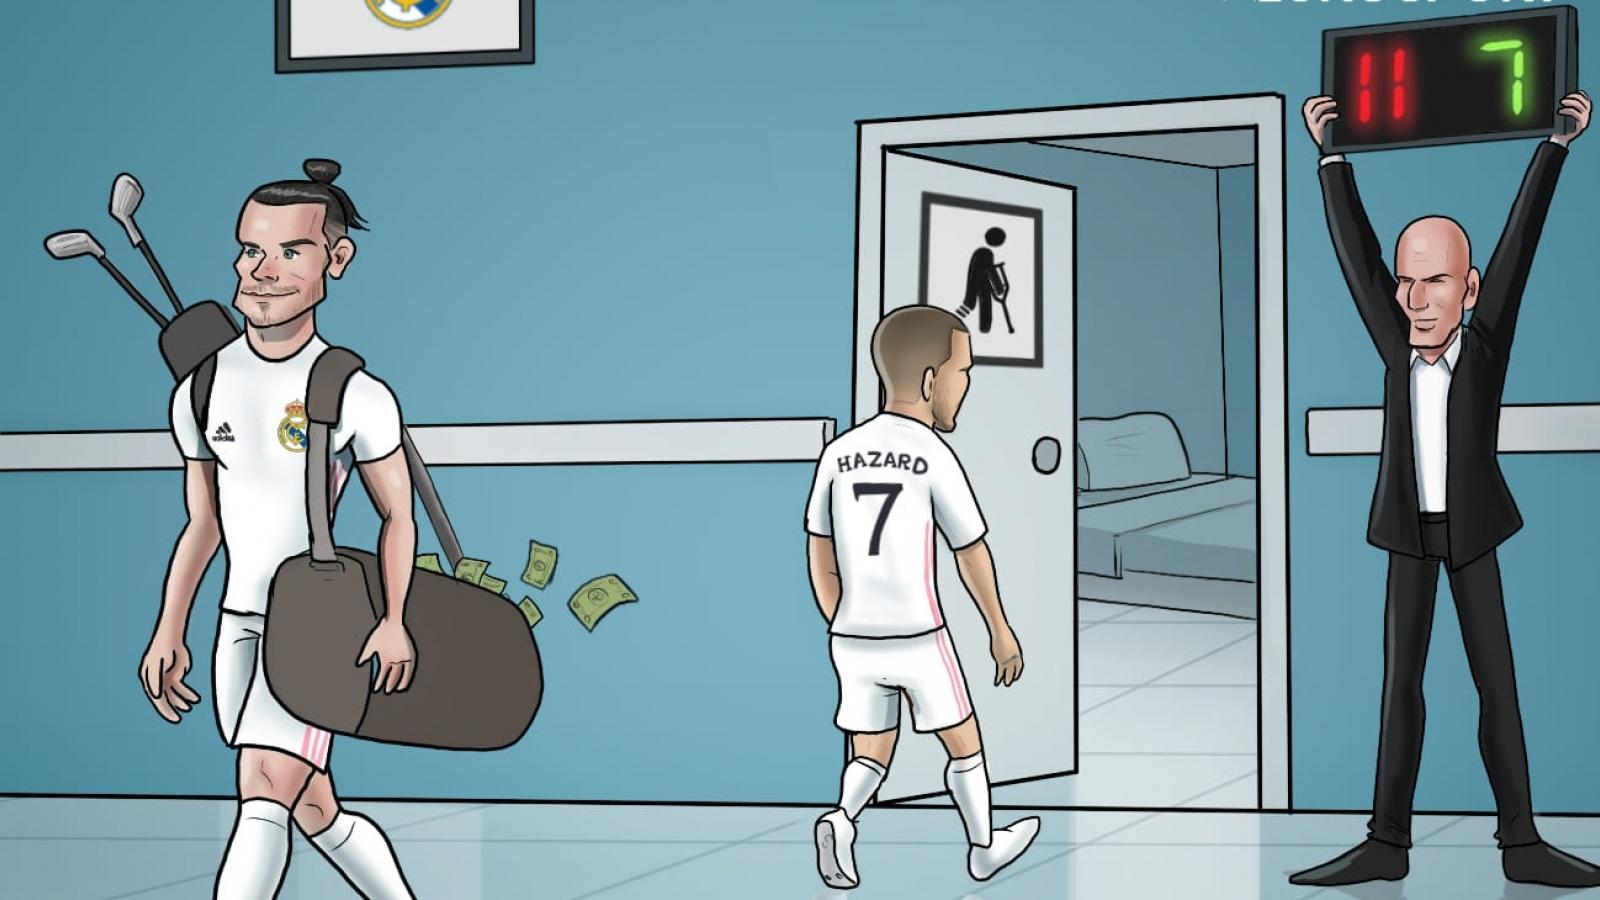 "Biếm họa 24h: Hazard thay Gareth Bale làm chủ ""bệnh viện"" Real Madrid"